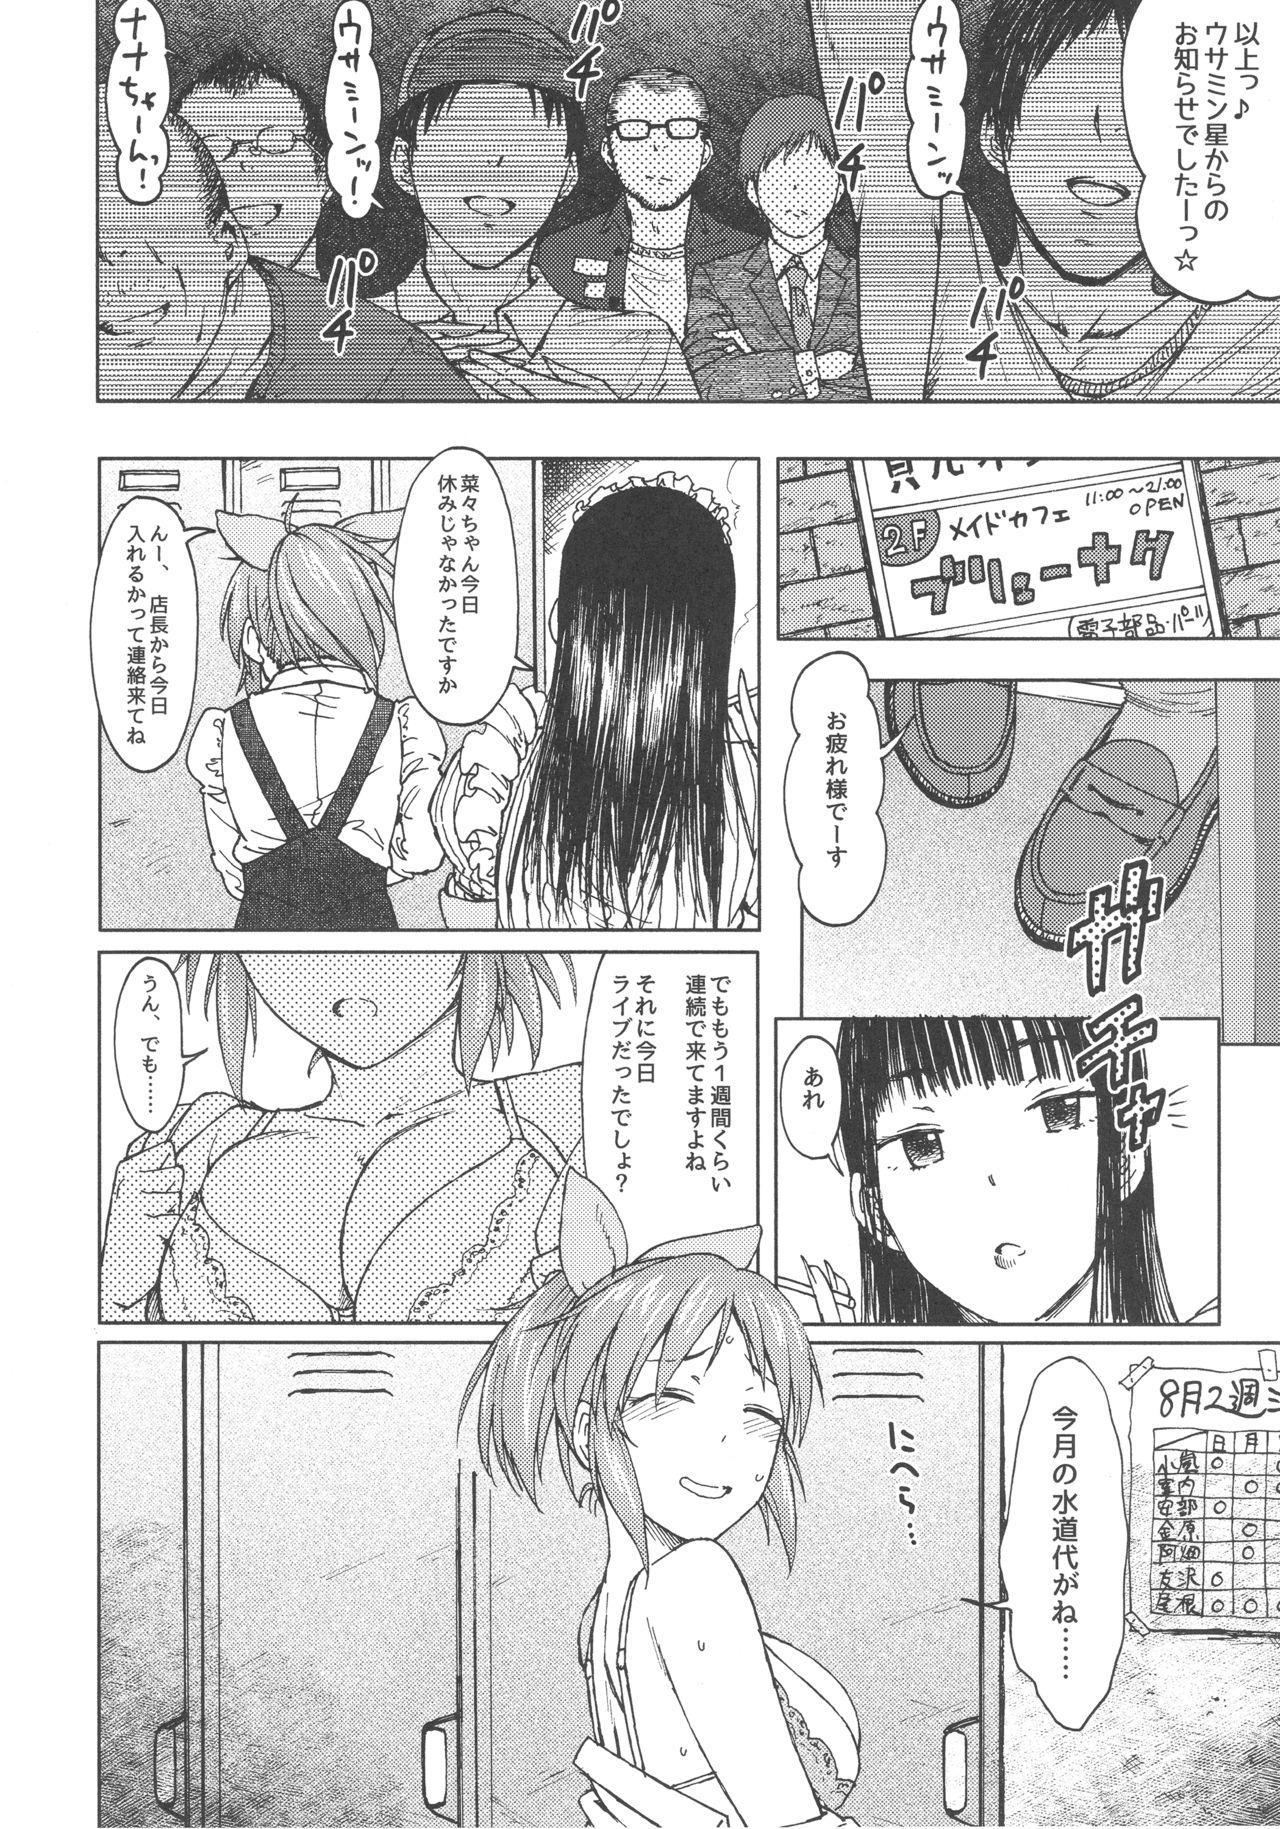 Aoi Hana 3